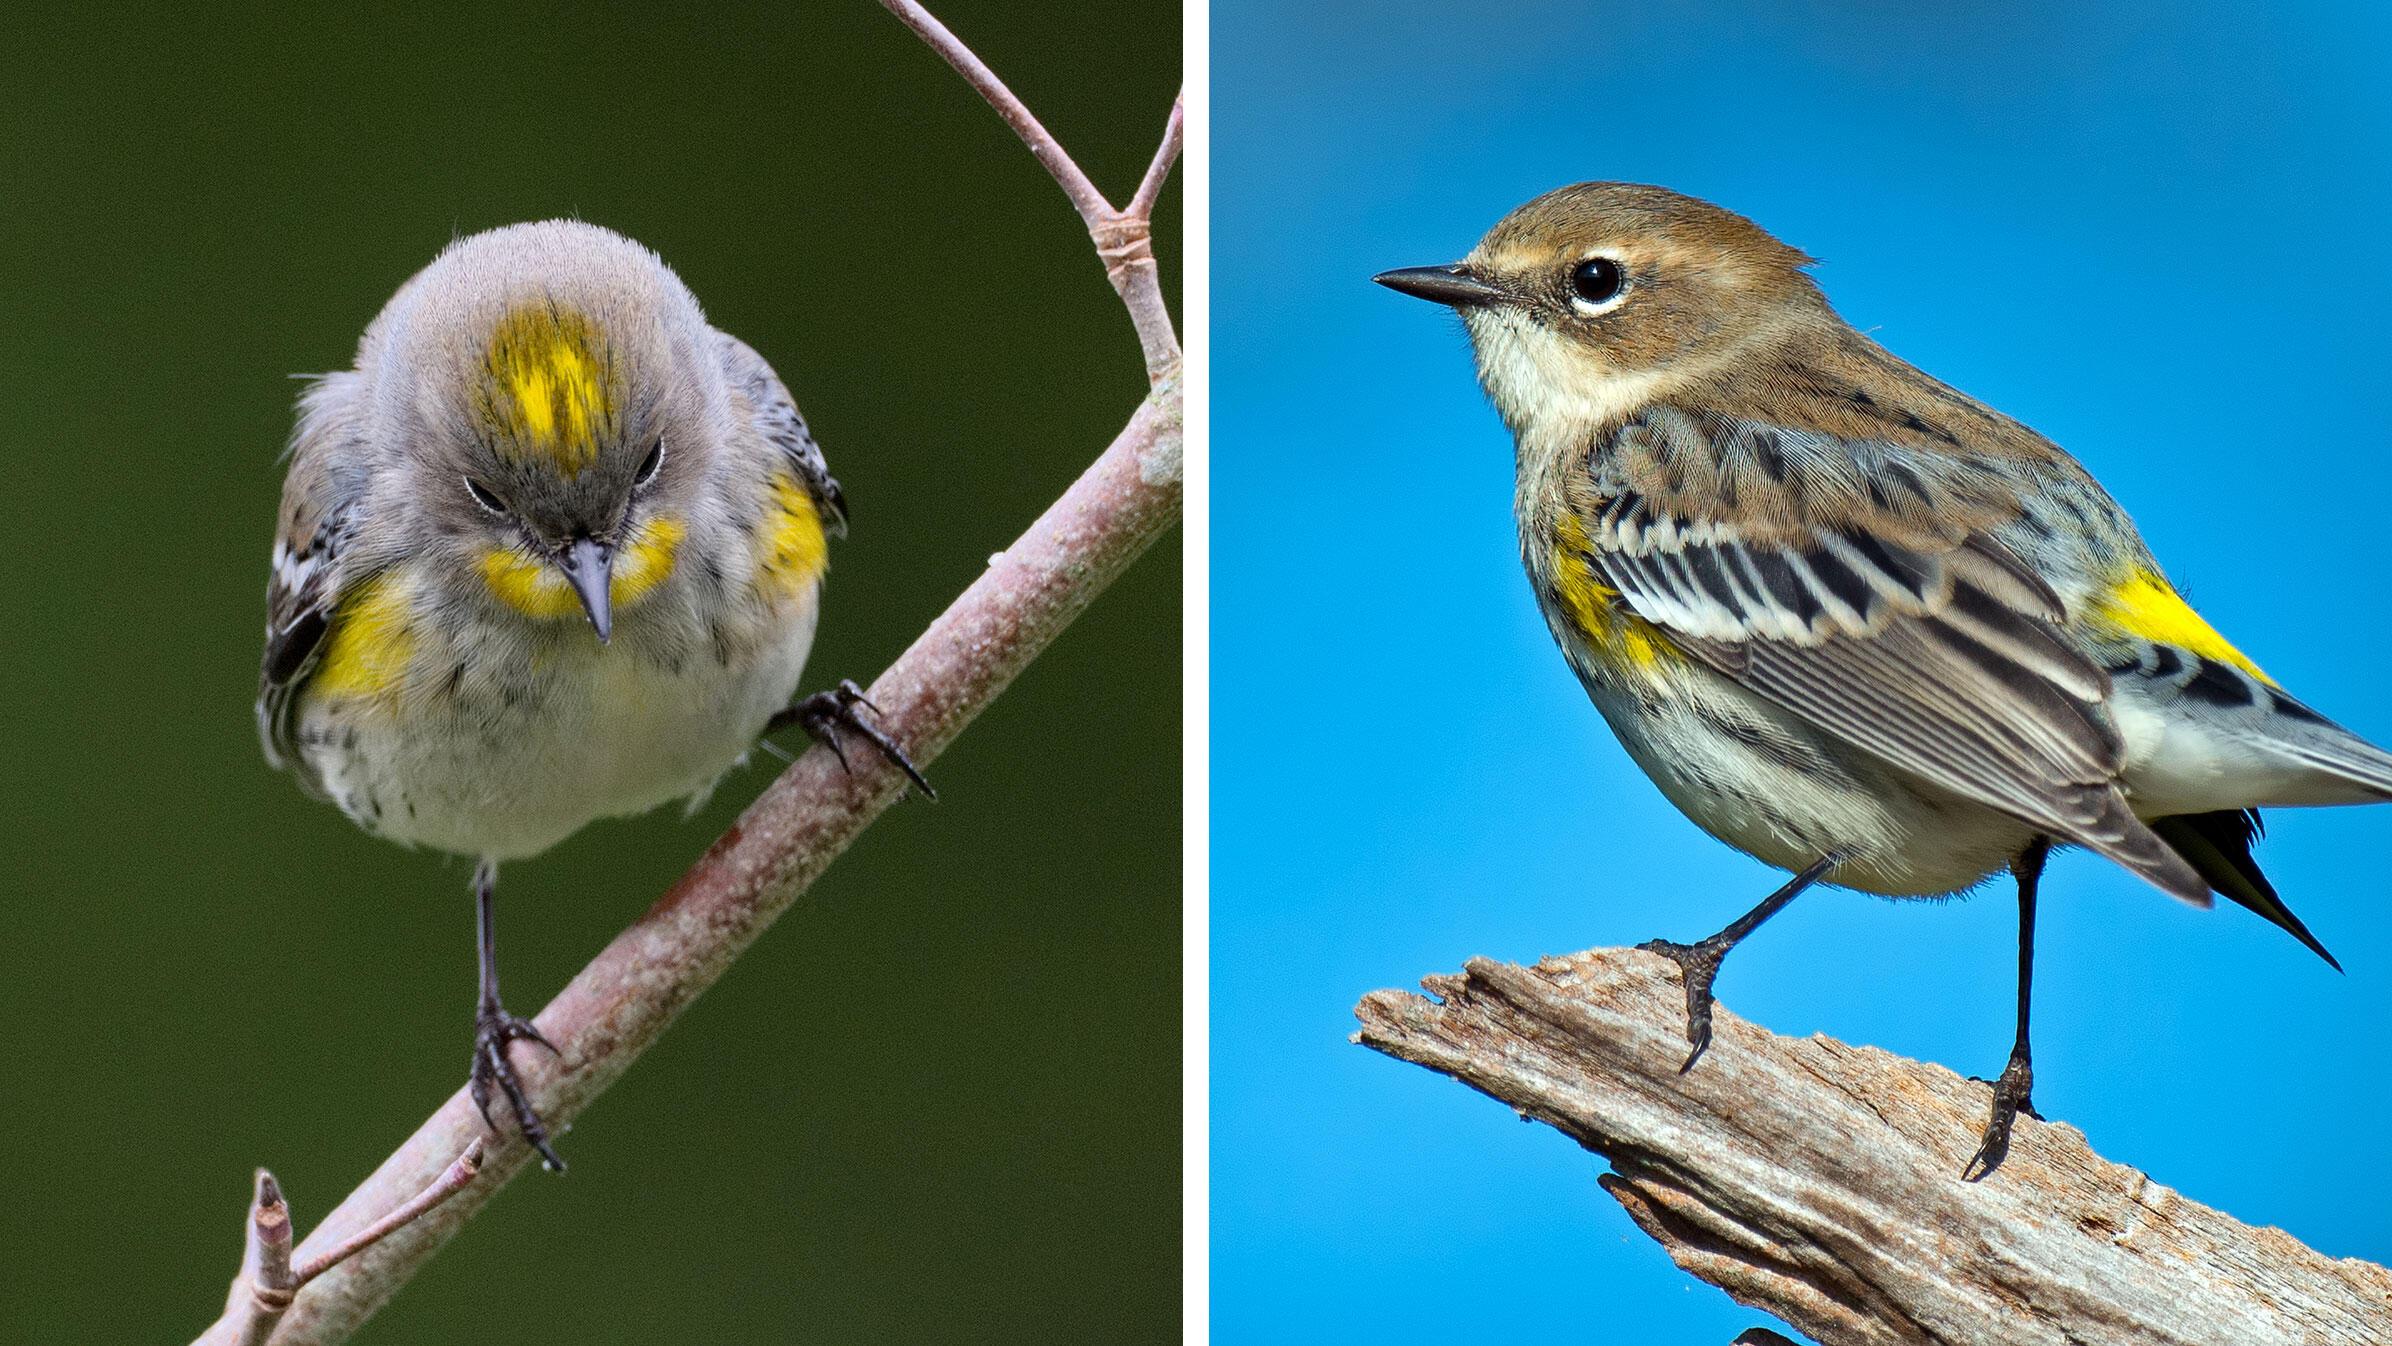 From left: Audubon's Warbler. Photo: Rick Cameron/Flickr (CC BY-NC-ND 2.0); Myrtle Warbler. Photo: Brian Kushner